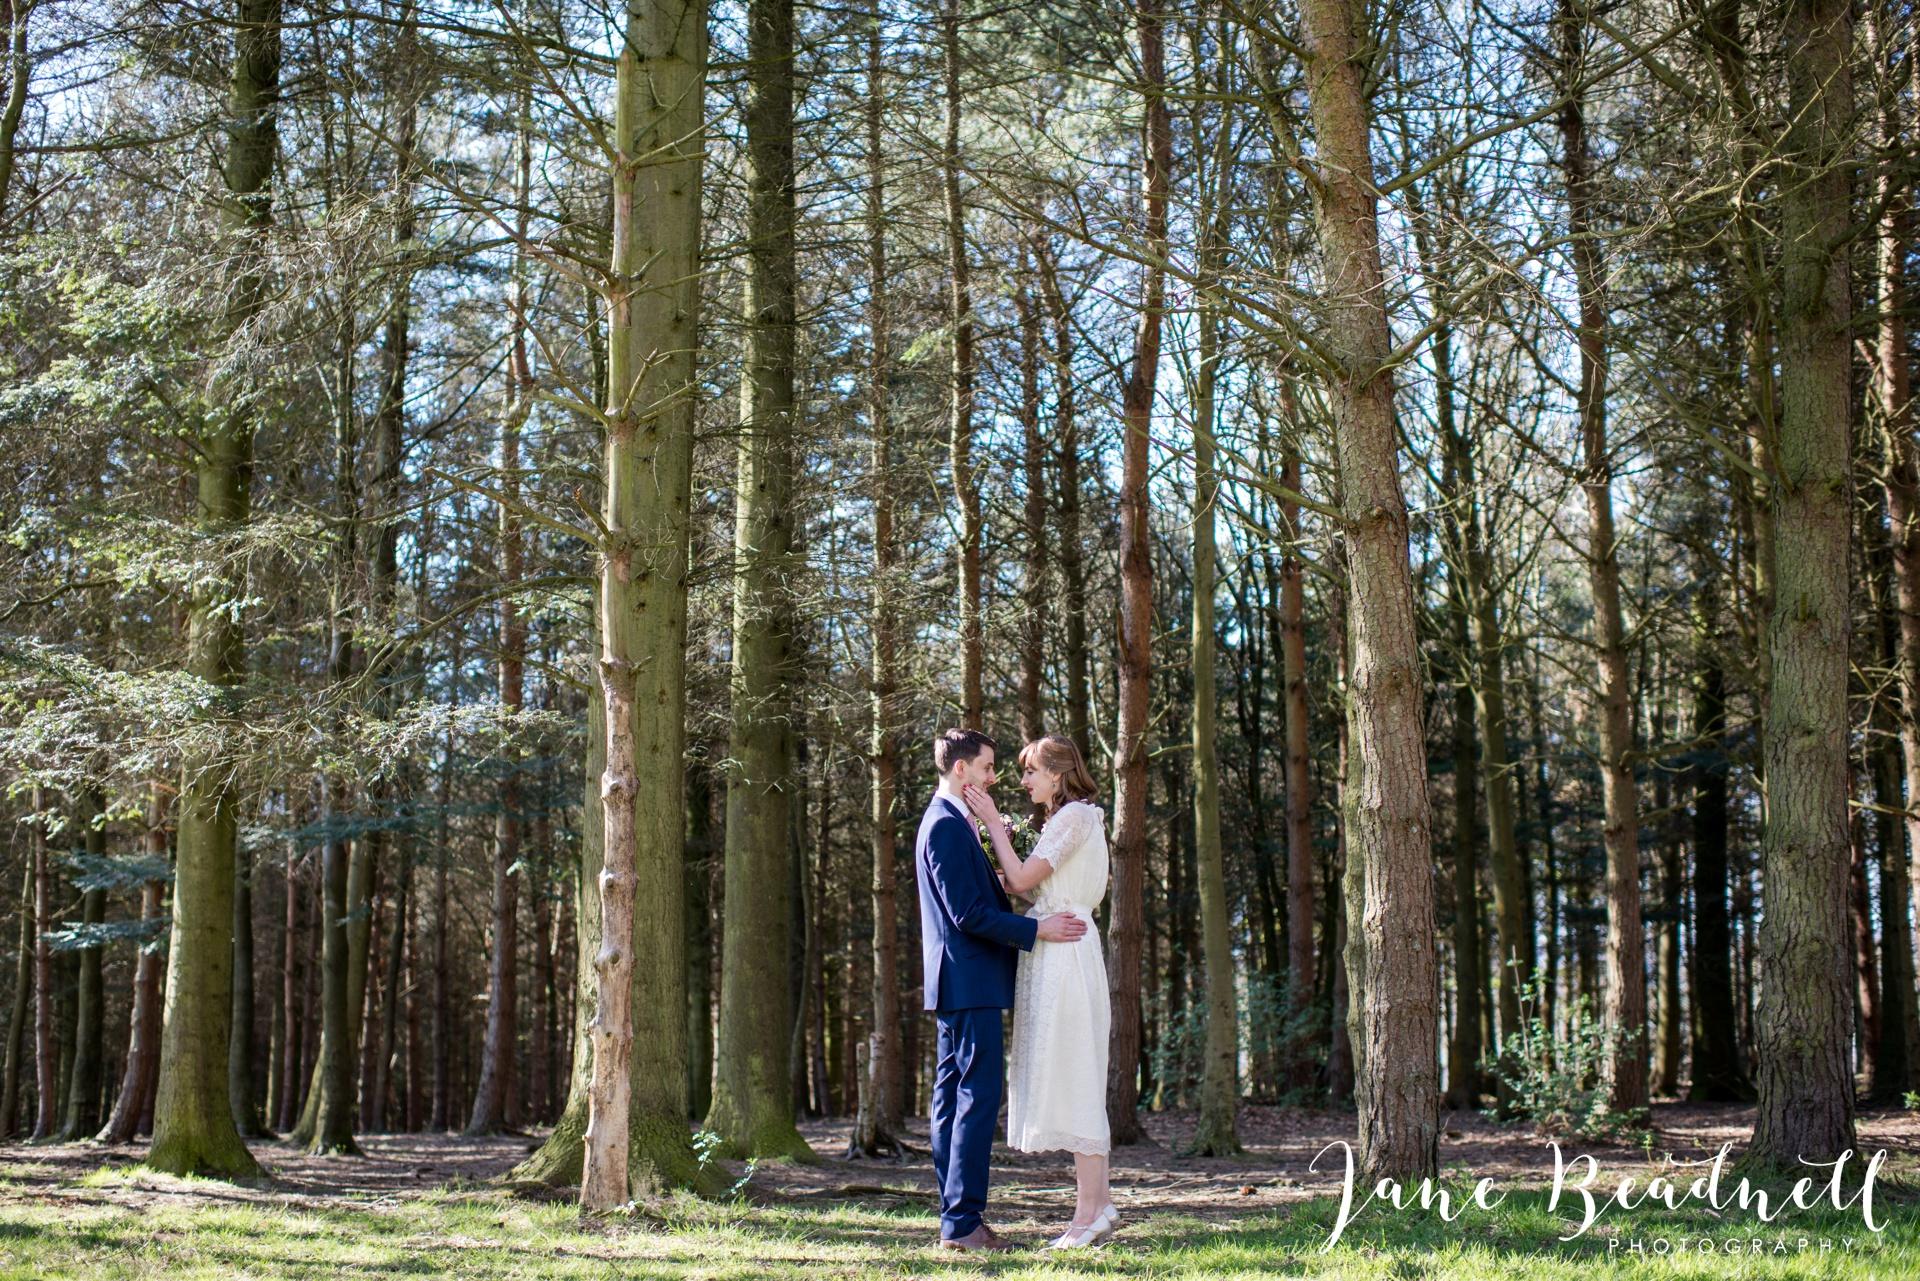 Jane Beadnell fine art wedding photographer The Cheerful Chilli Barn Otley_0030